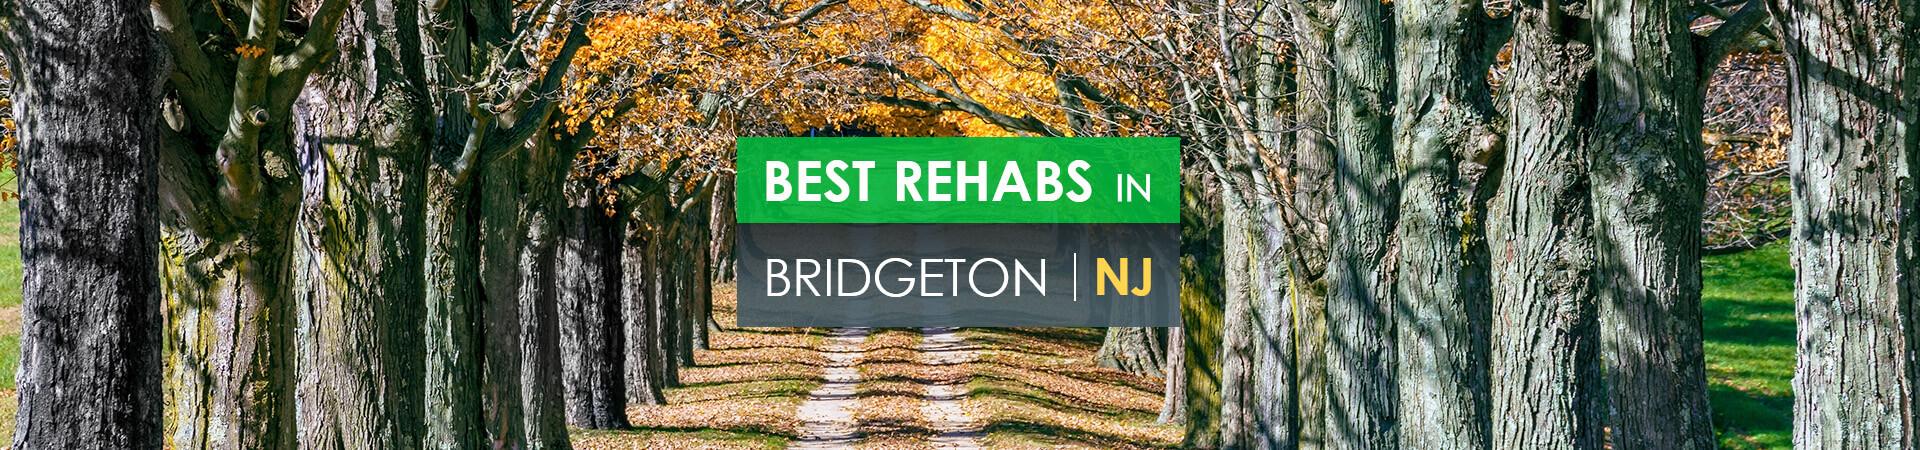 Best rehabs in Bridgeton, NJ